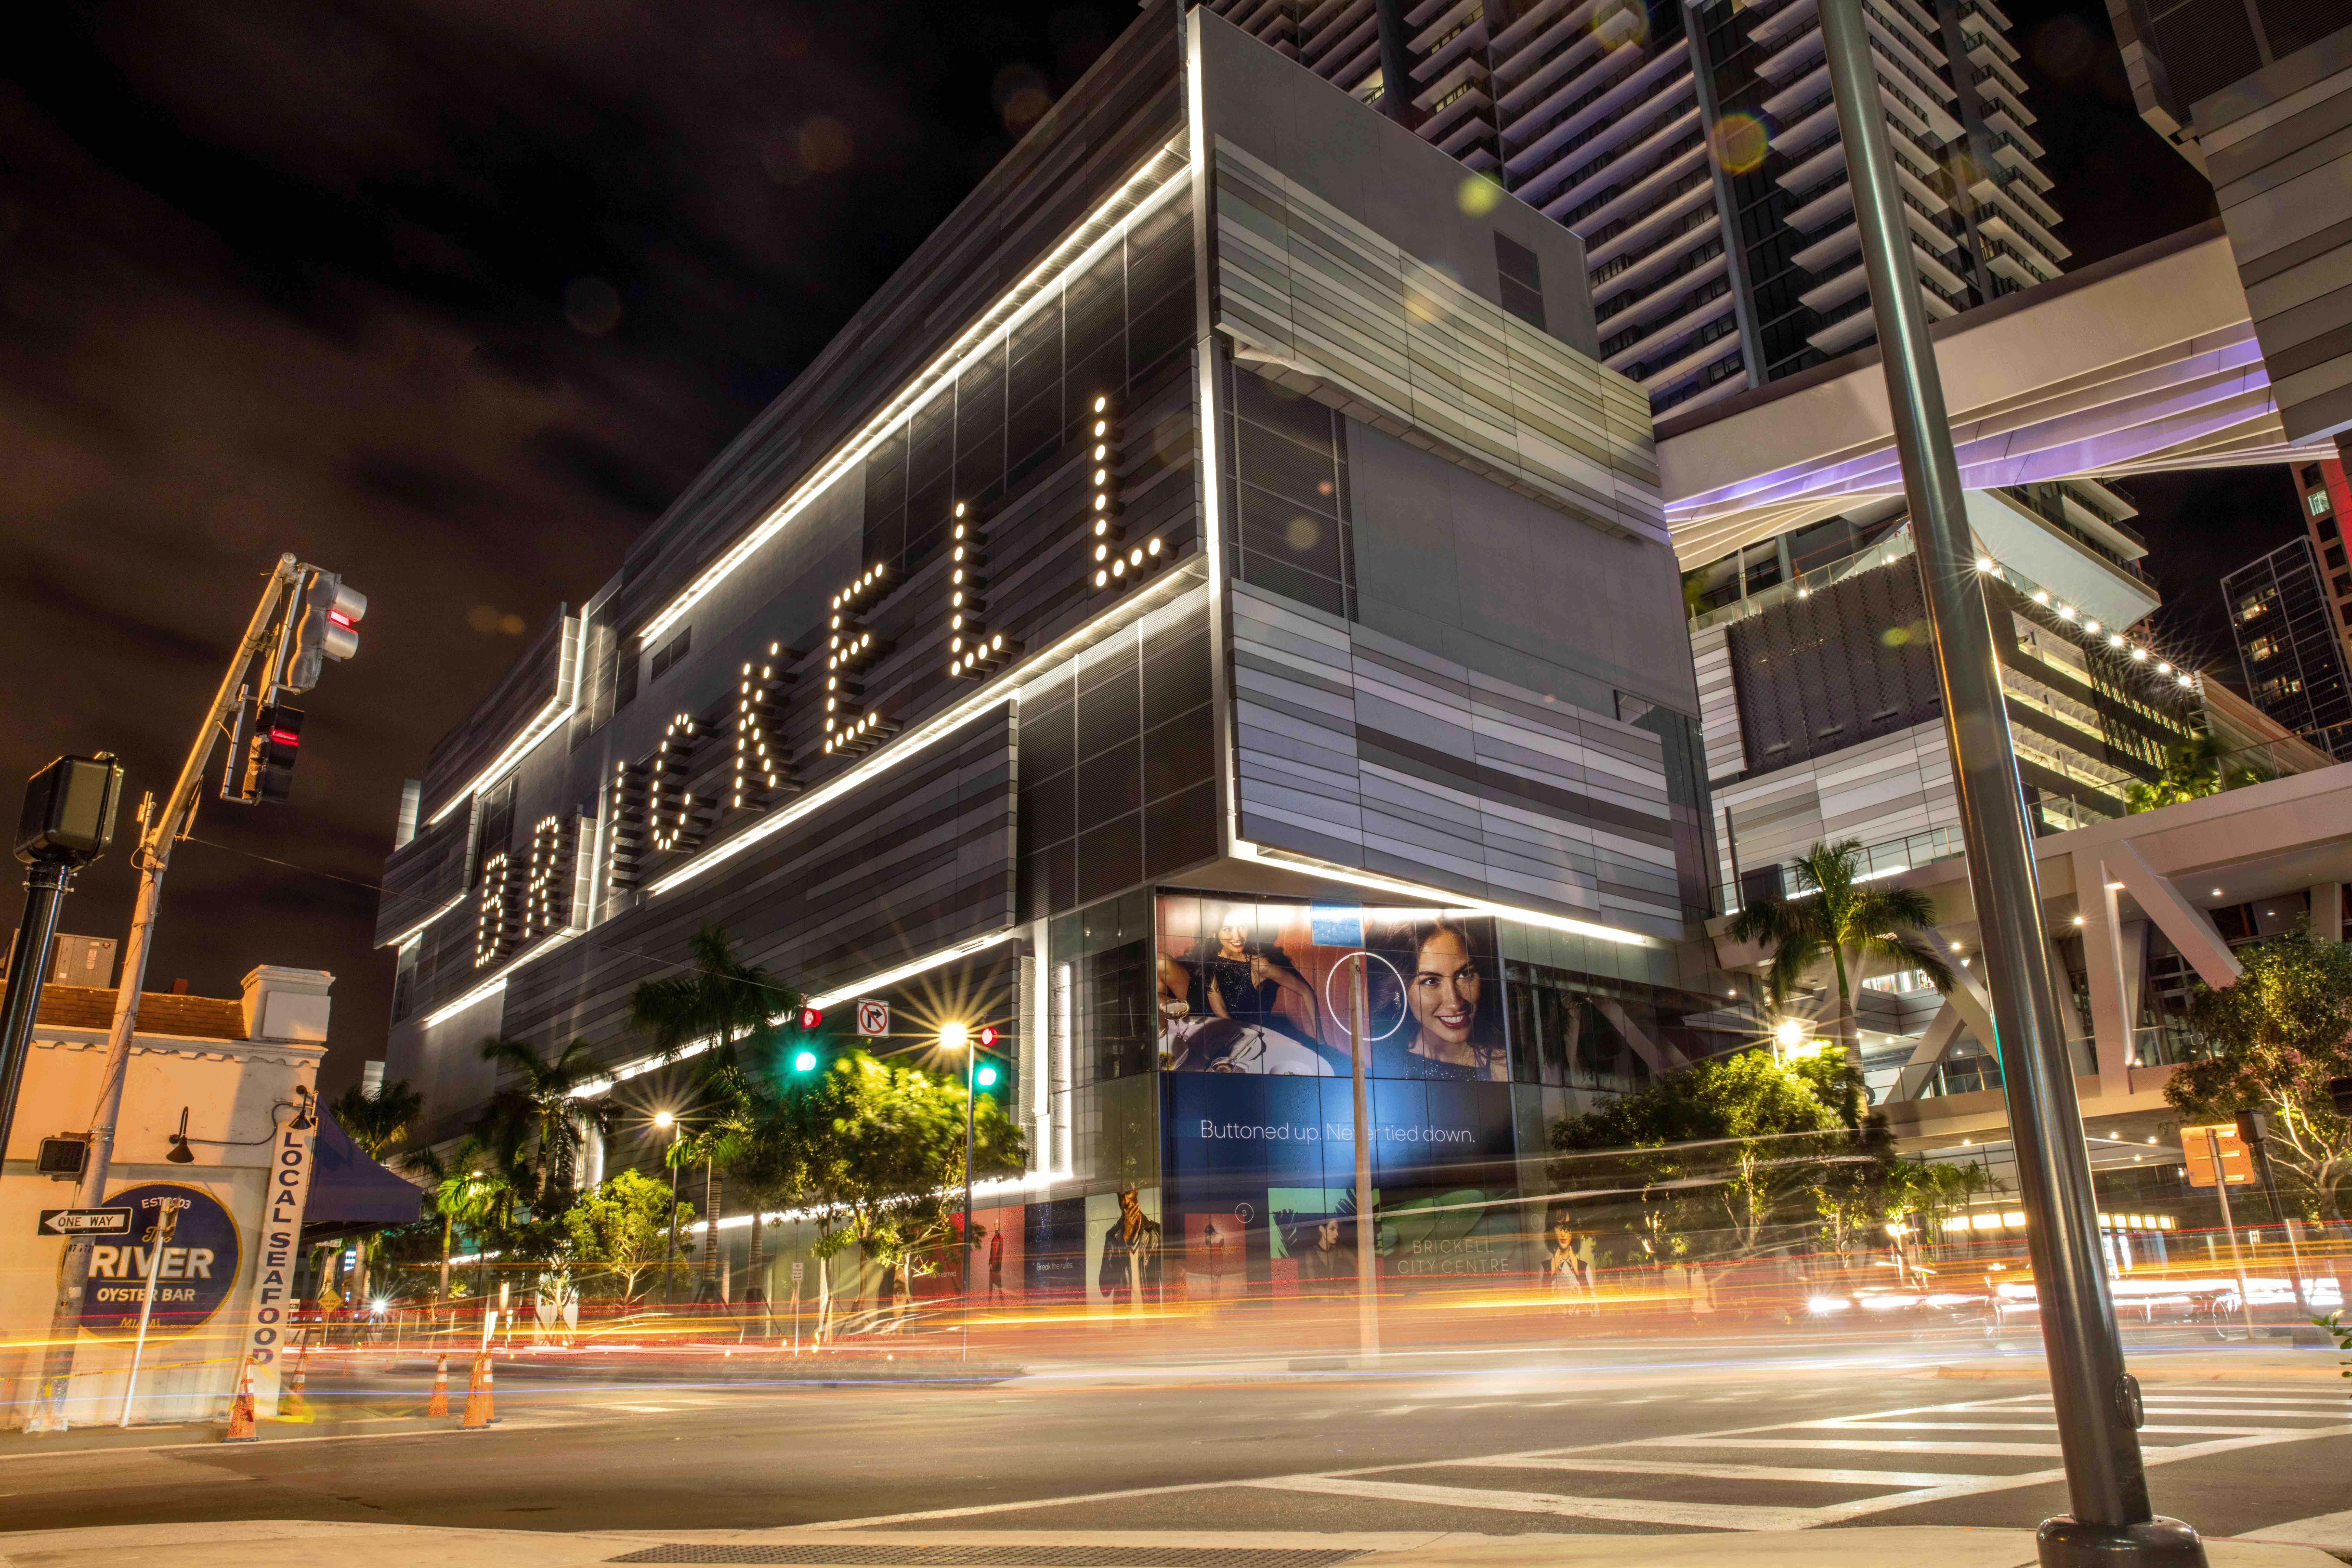 appartement à Brickell; Barnes Miami; agence immobilière Miami; achat; Acheter à Miami; vente; vendre à Miami; location; louer à Miami; immobilier de prestige Miami; appartement à Miami; appartement Miami; condo à Miami; condo Miami; maison à Miami; maison Miami; vivre à Miami; s'expatrier à Miami; achat sur plans à Miami; programmes neufs Miami; immobilier Miami; immobilier à Miami; marché immobilier à Miami; MIami Beach; Coconut Grove; Brickell; Edgewater; Downtown Miami; Coral Gables; Key Biscayne; Fort Lauderdale; Wynwood; immobilier commercial; immobilier commercial Miami